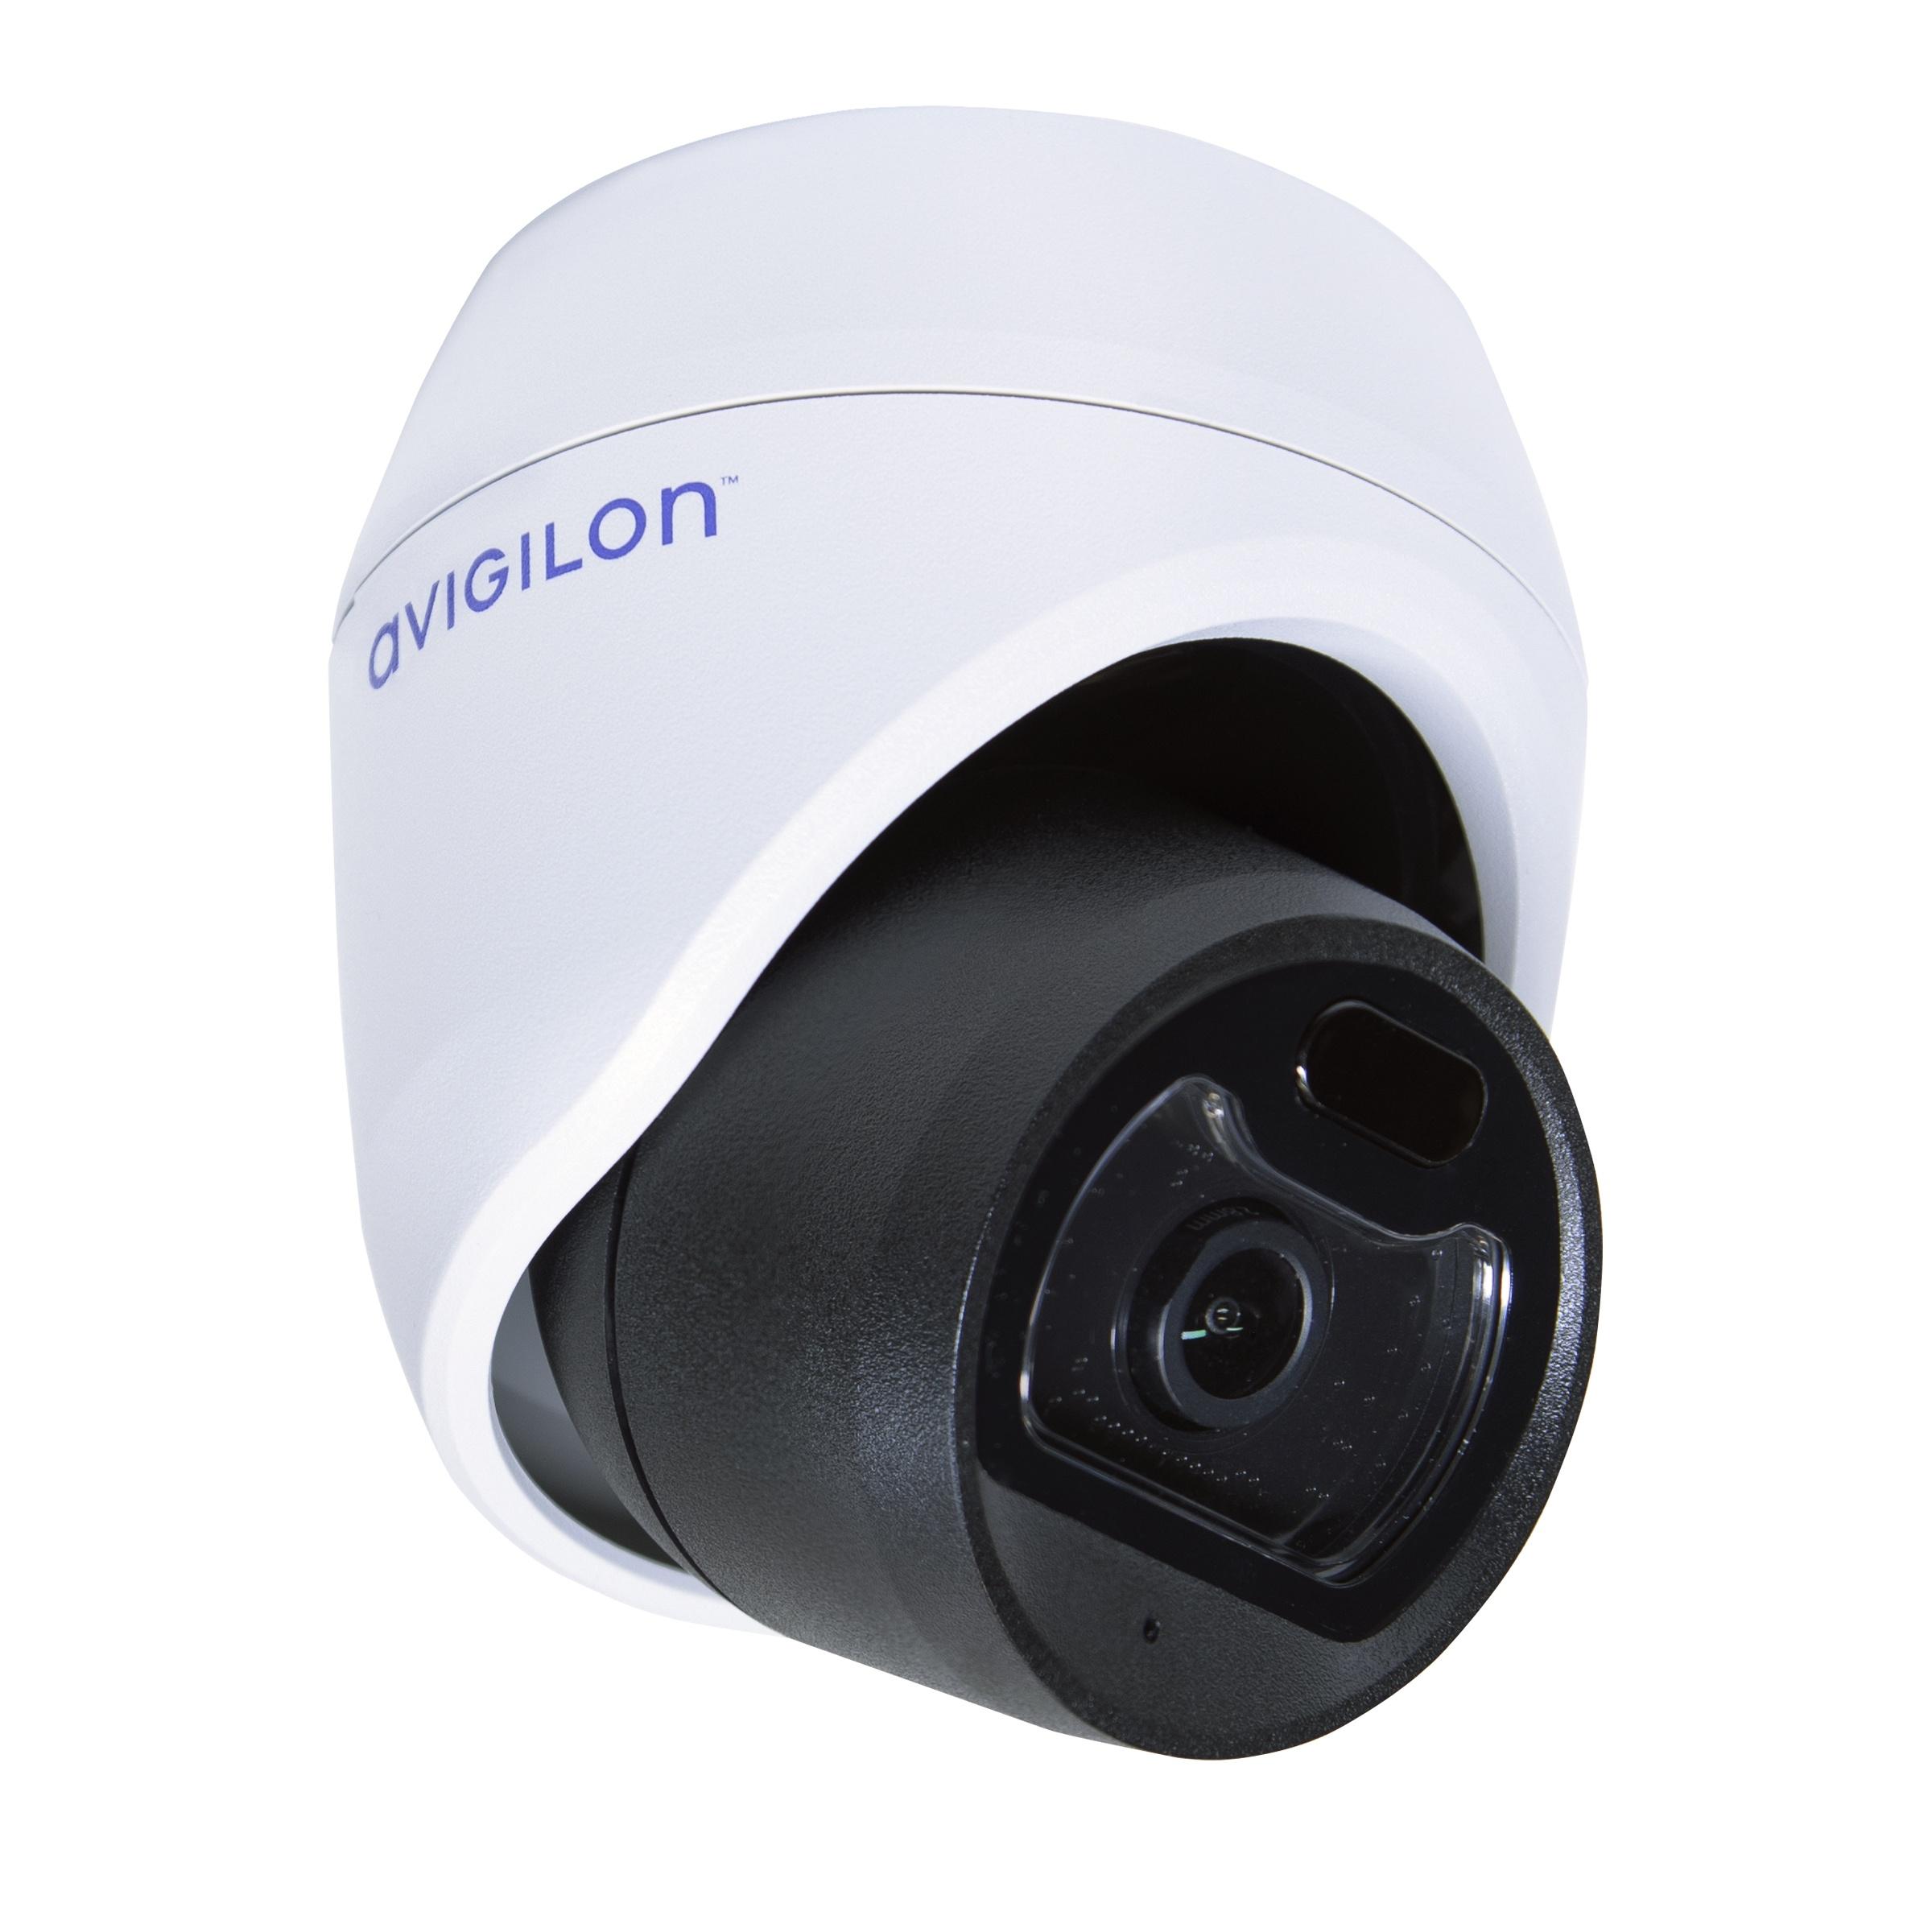 Avigilon H5M Security Camera